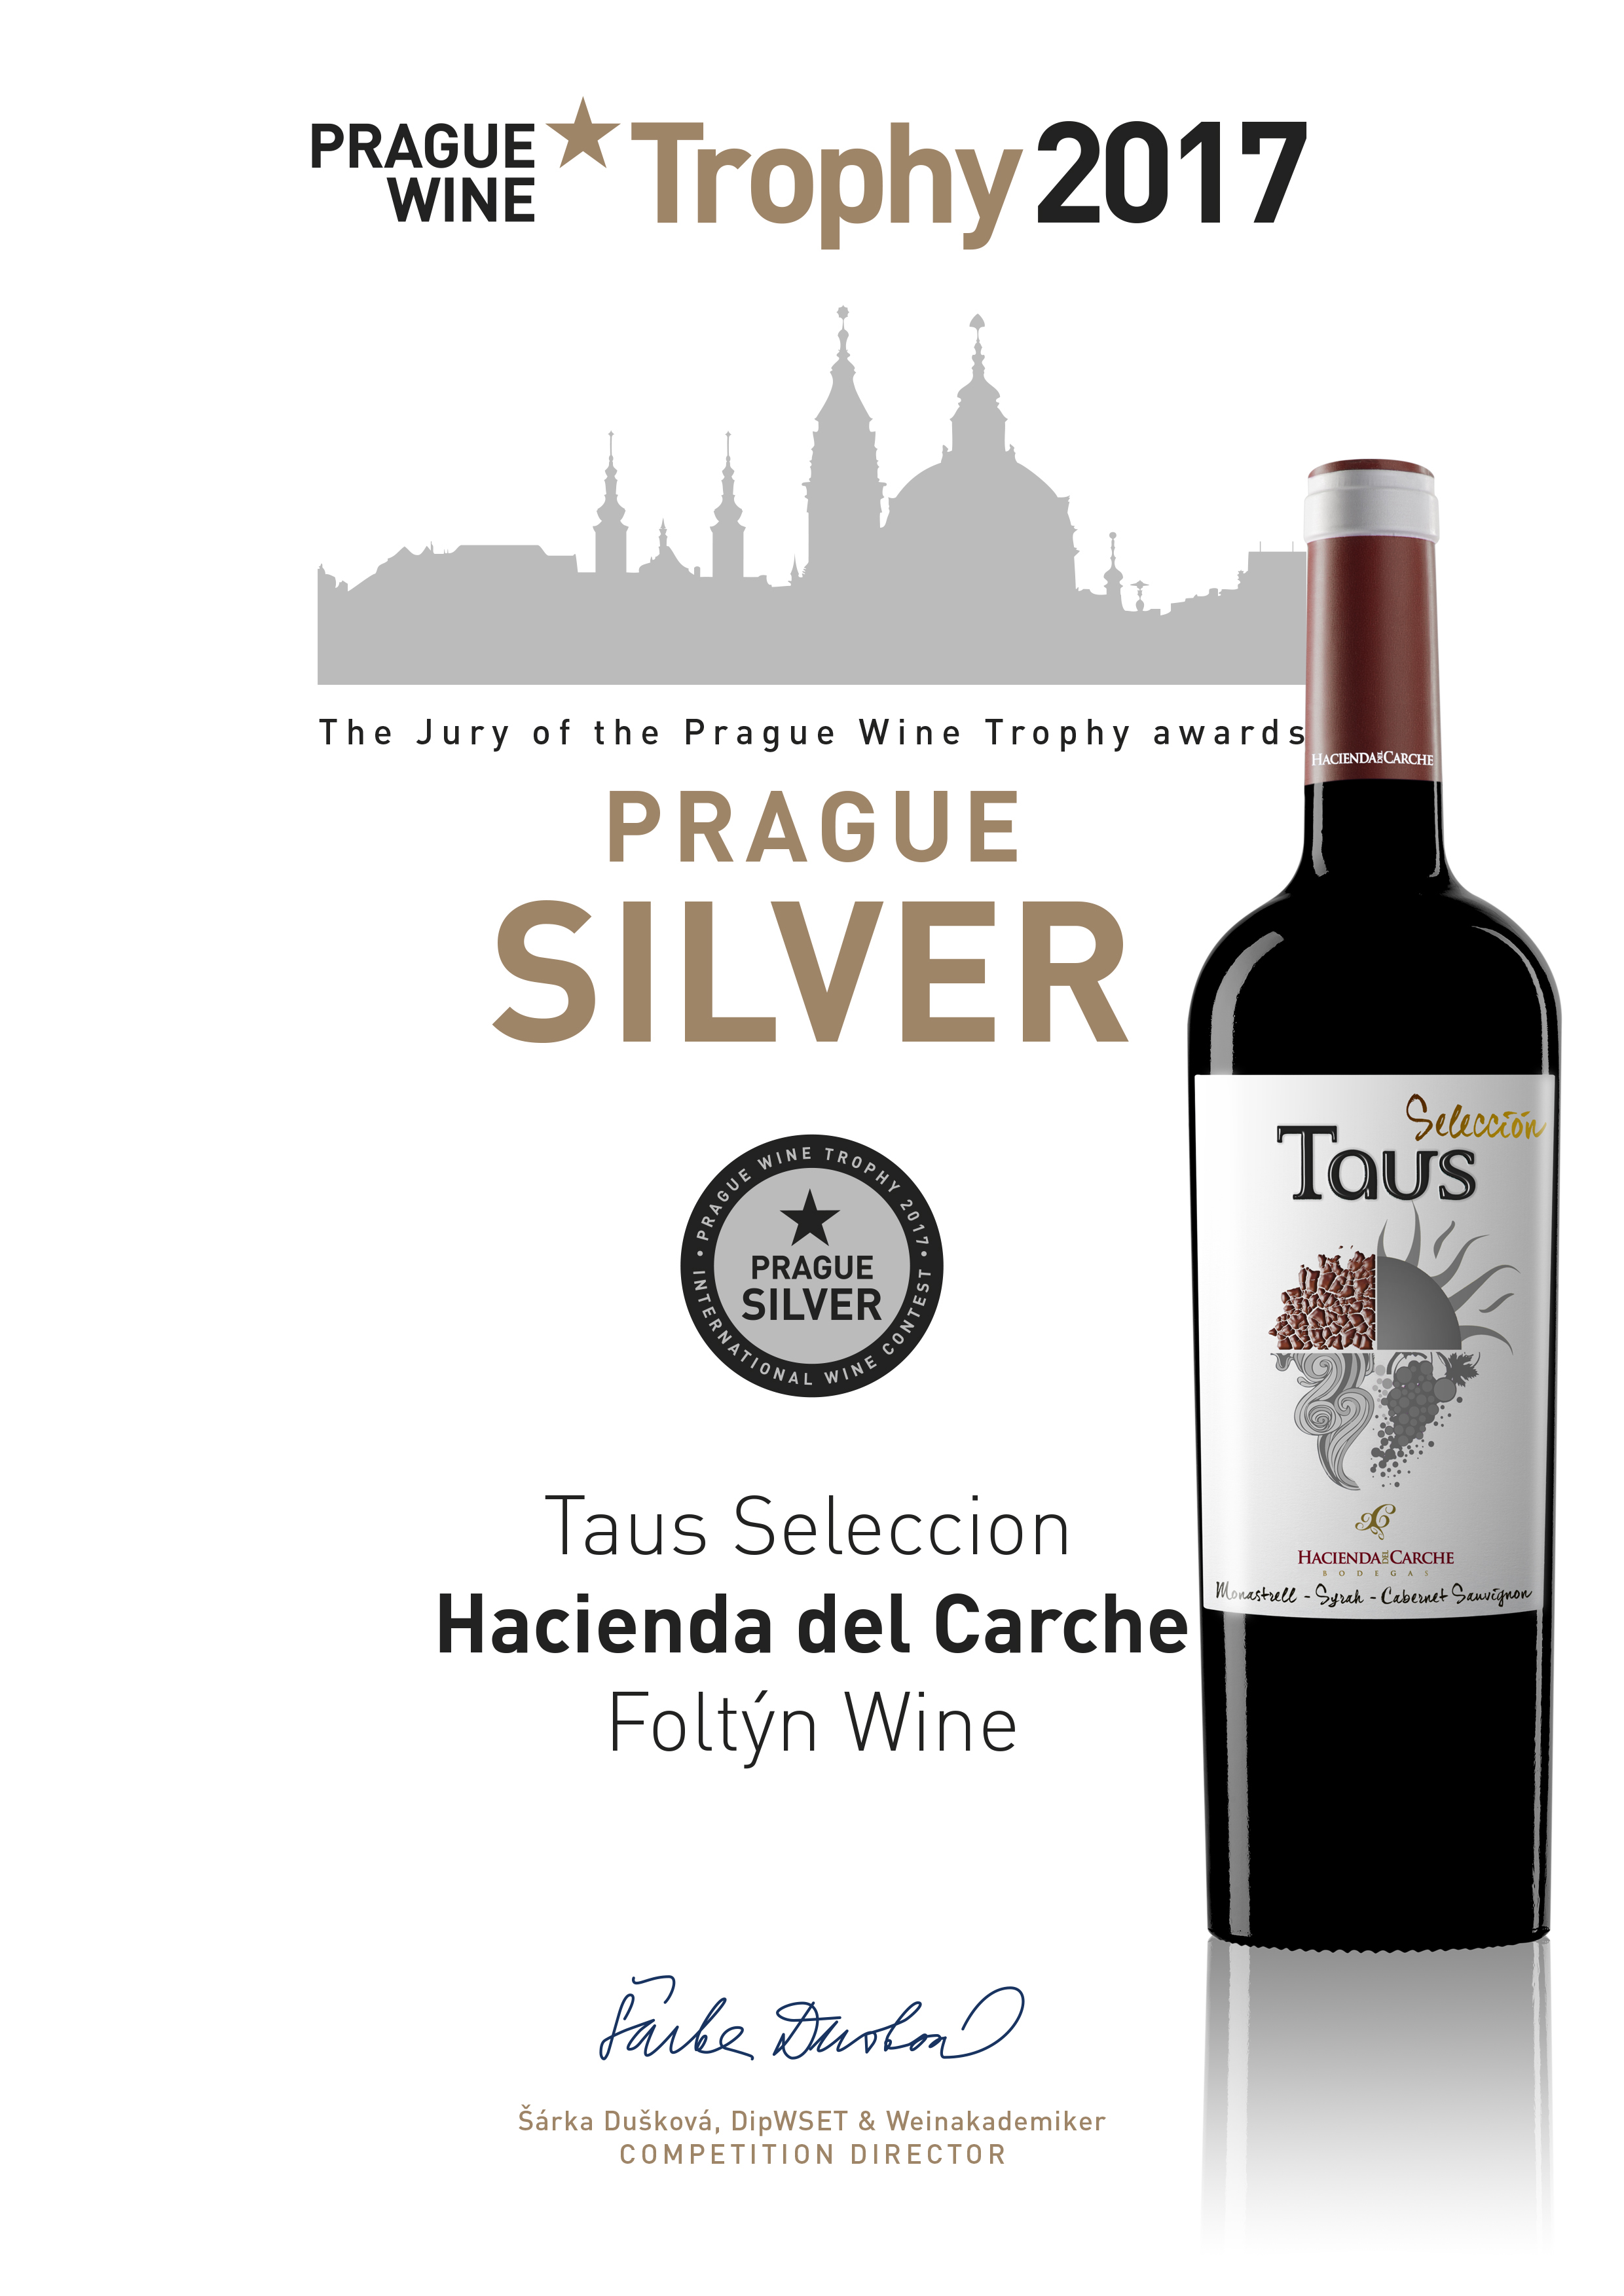 carche_taus_seleccion_2015 Prague Wine